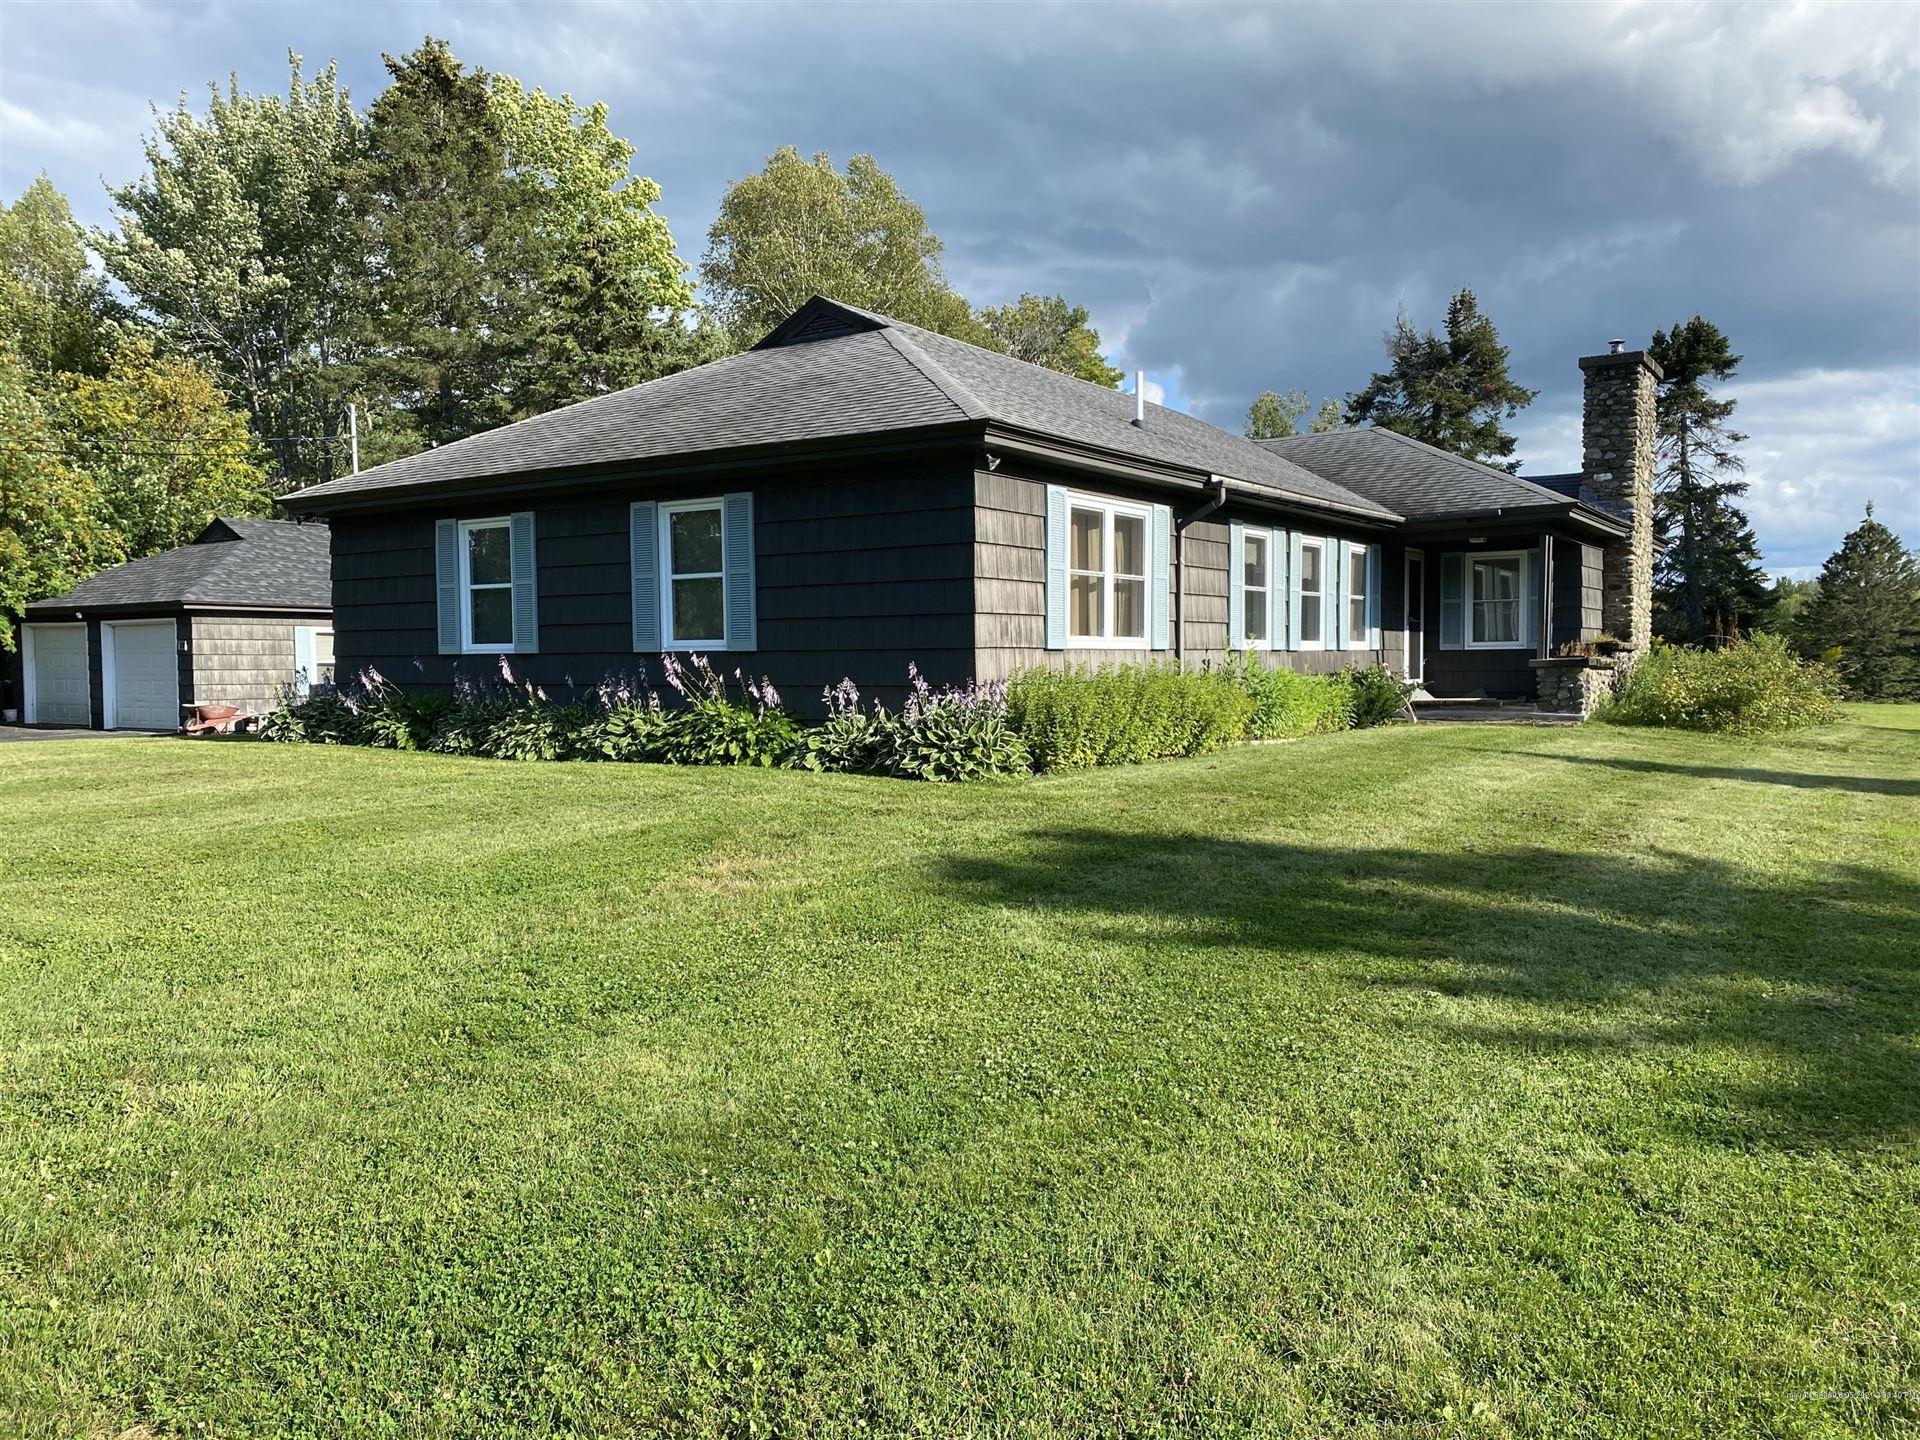 Photo of 53 Baird Road, Caribou, ME 04736 (MLS # 1503205)